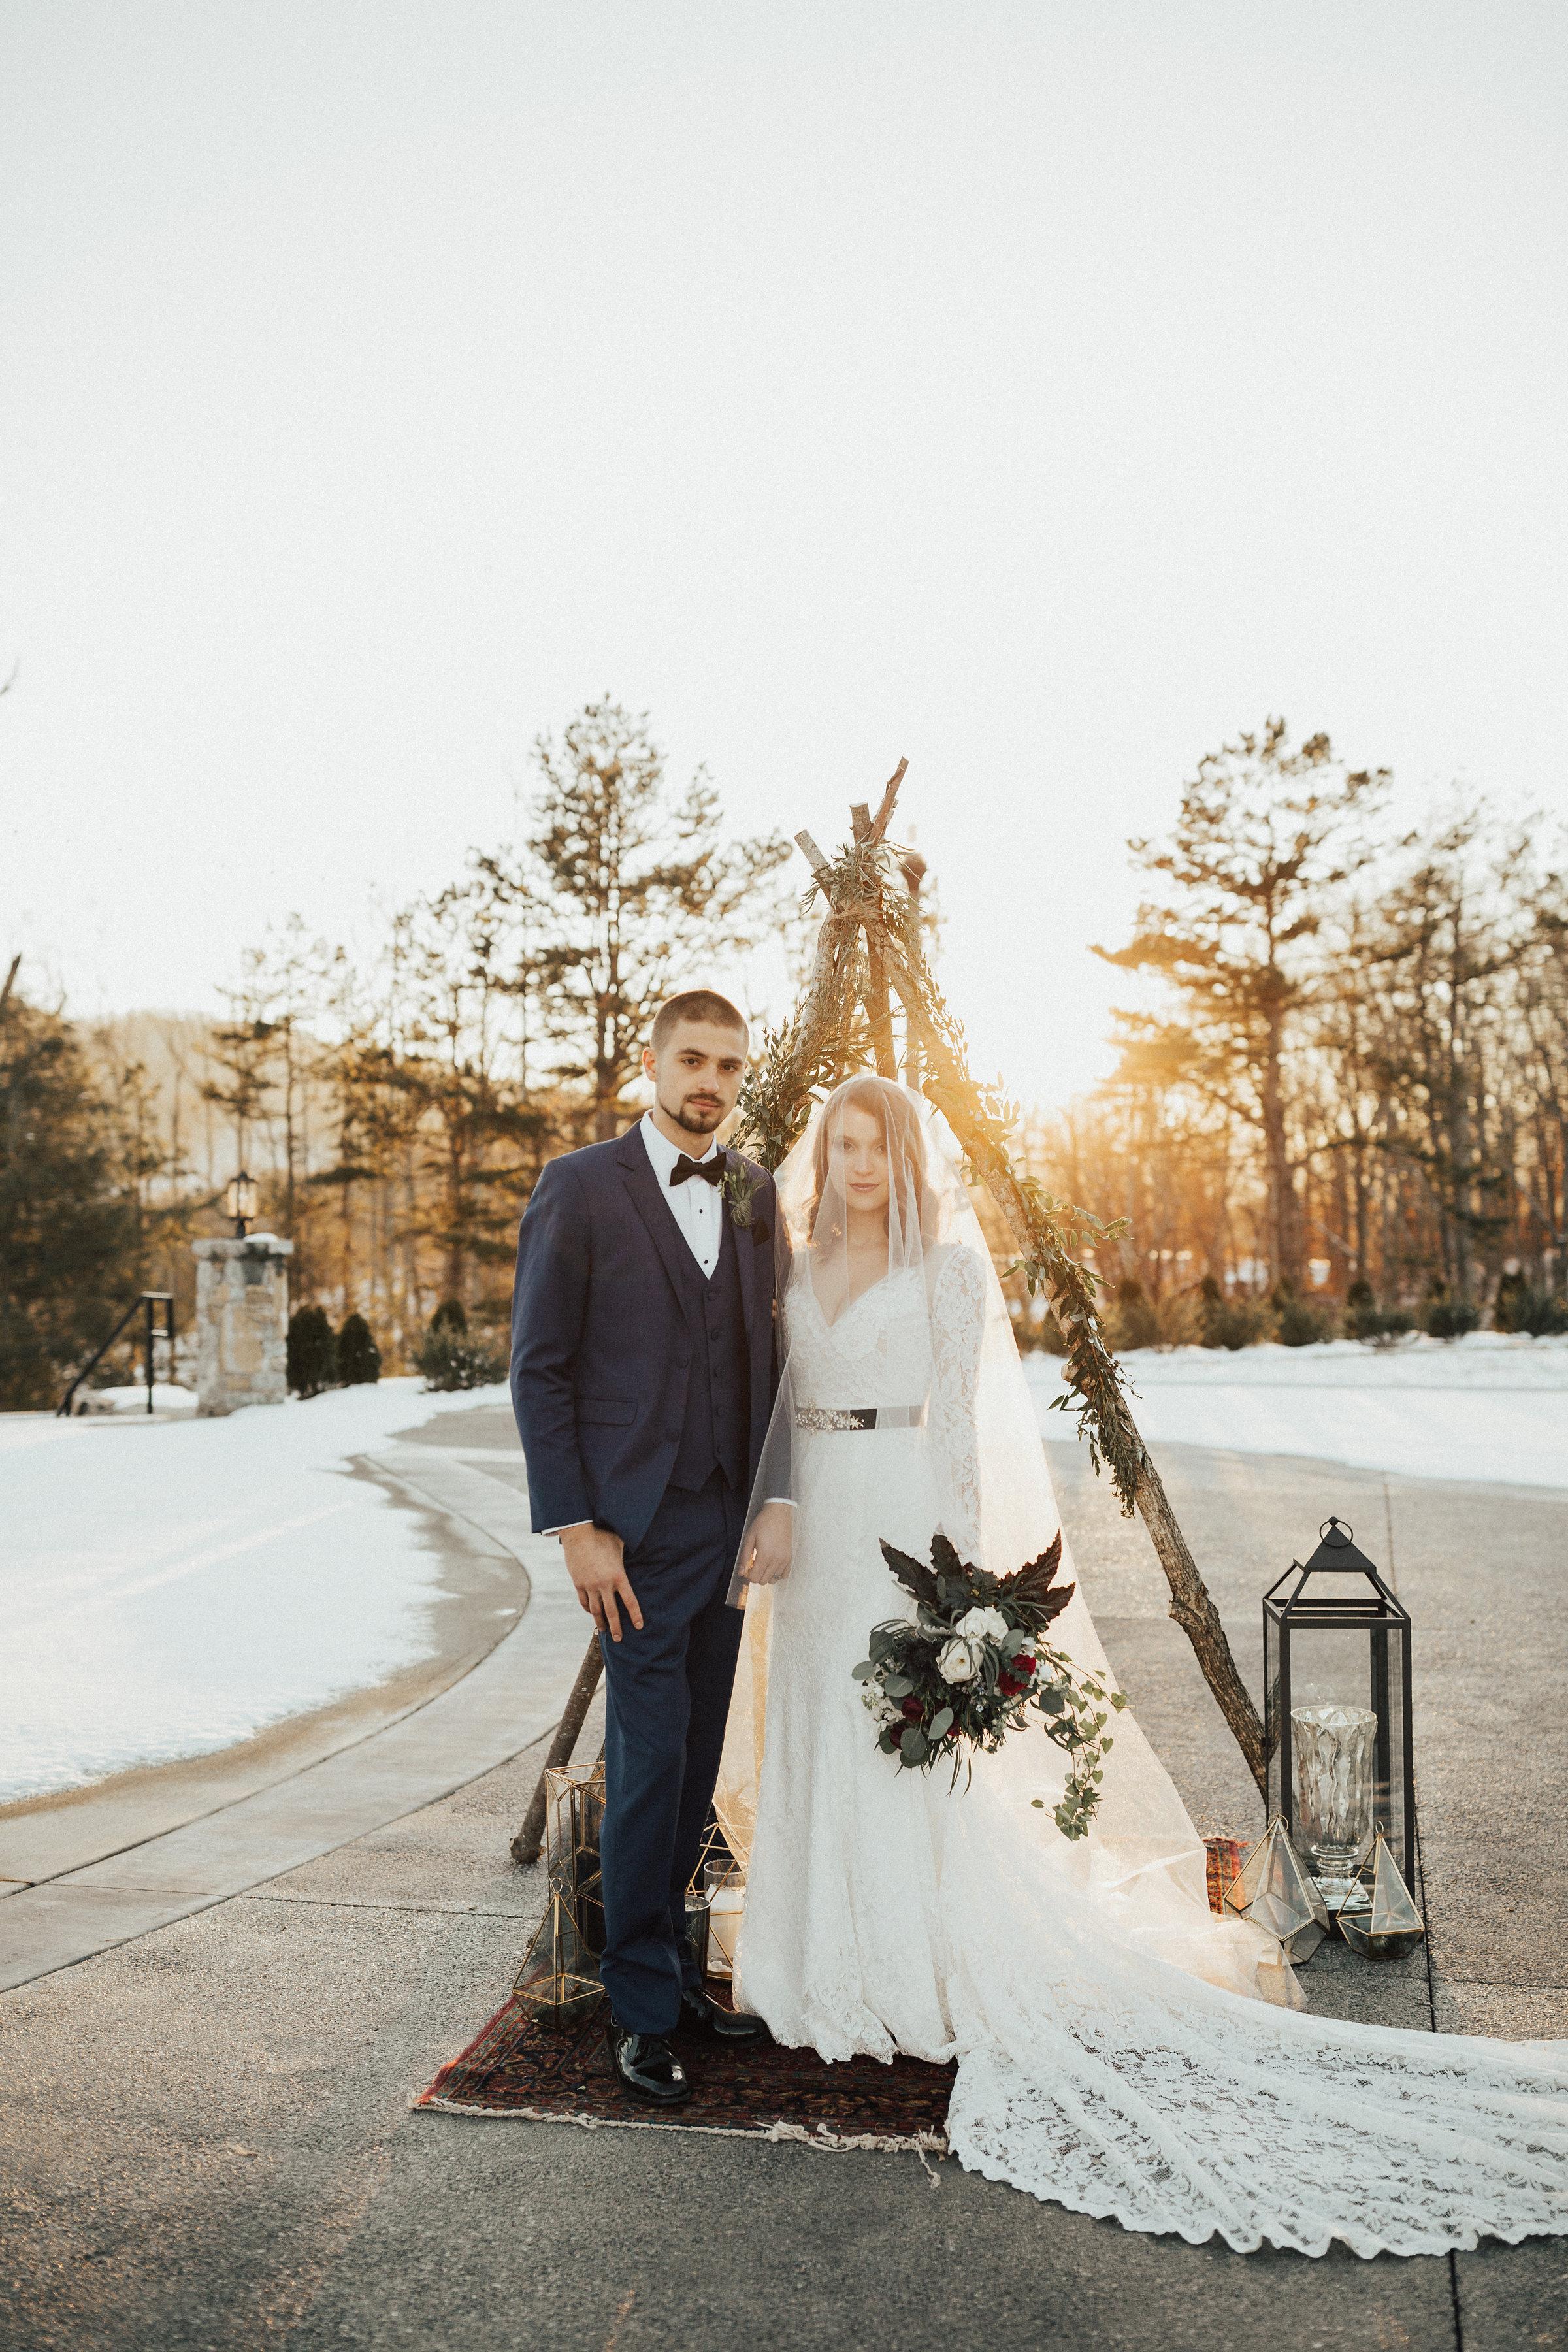 Joy-Unscripted-Wedding-Styled-Shoot-Celestial-Winter-88.jpg